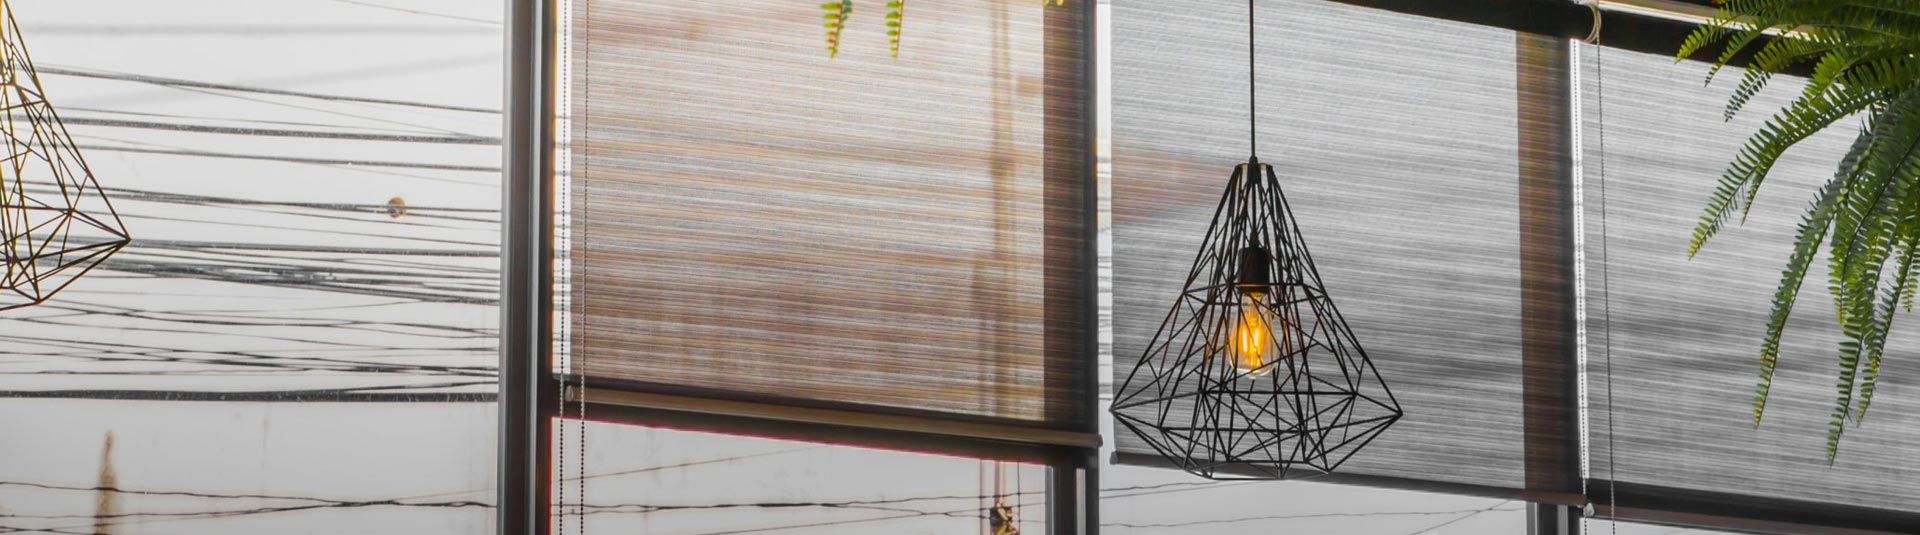 roller blinds installation